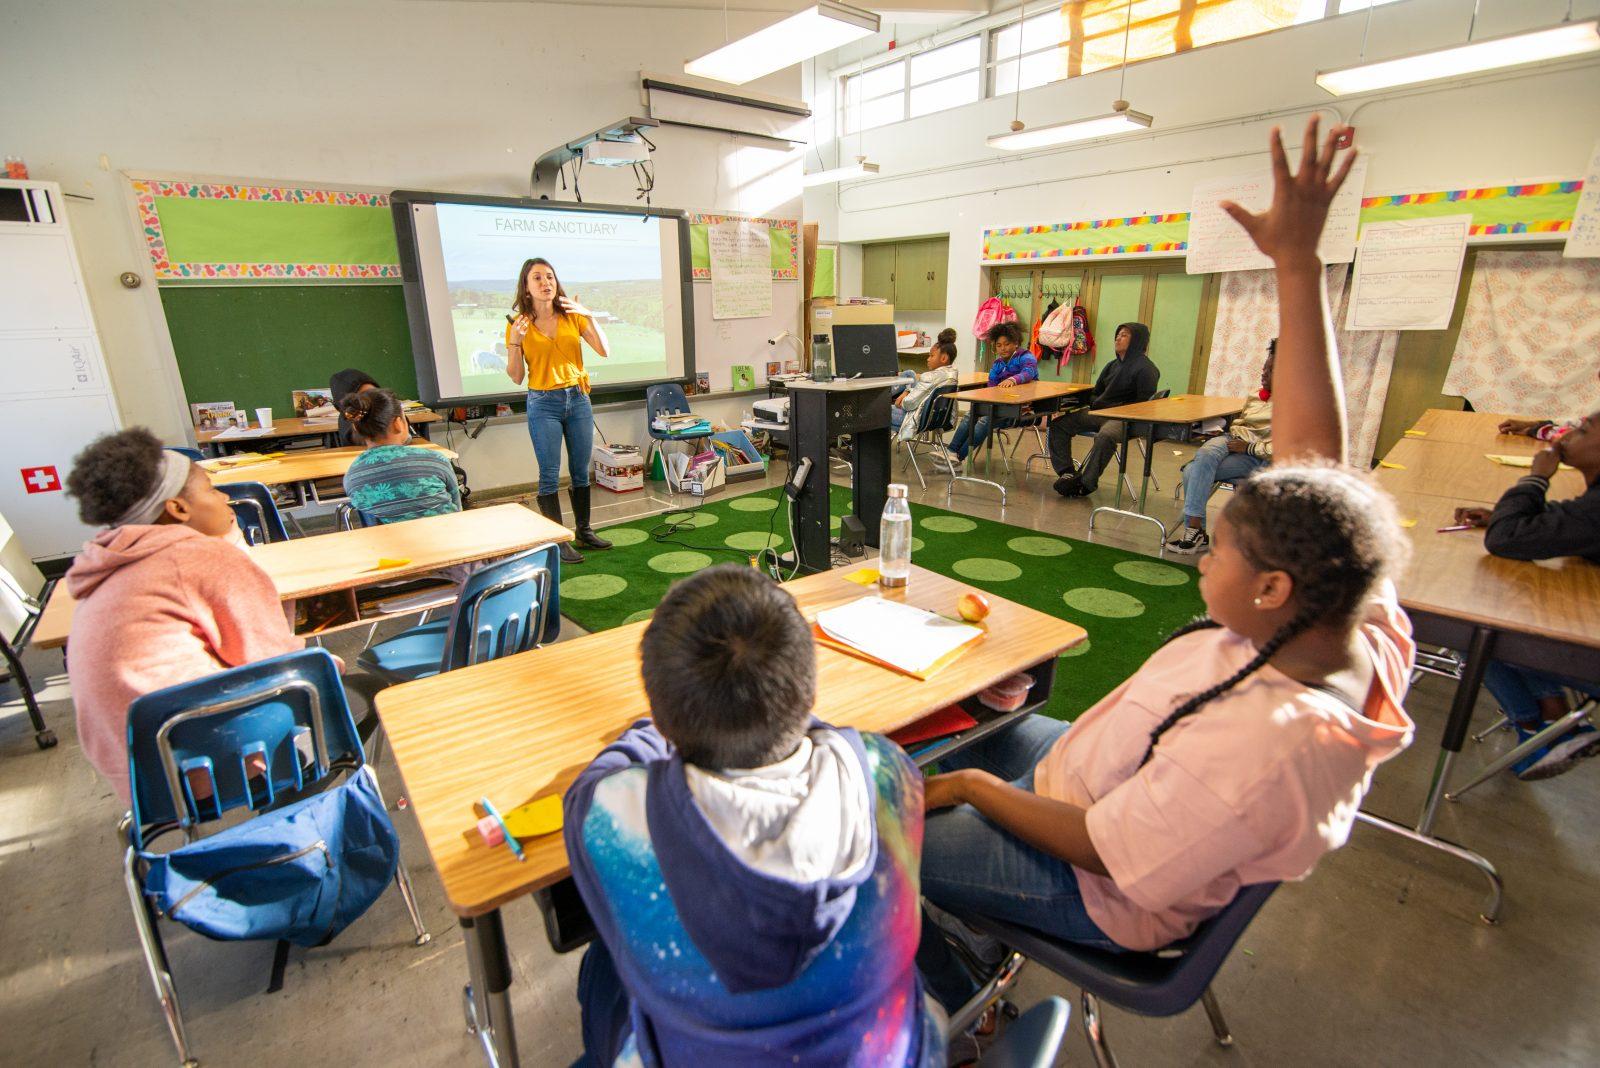 Farm Sanctuary Humane Educator in the classroom